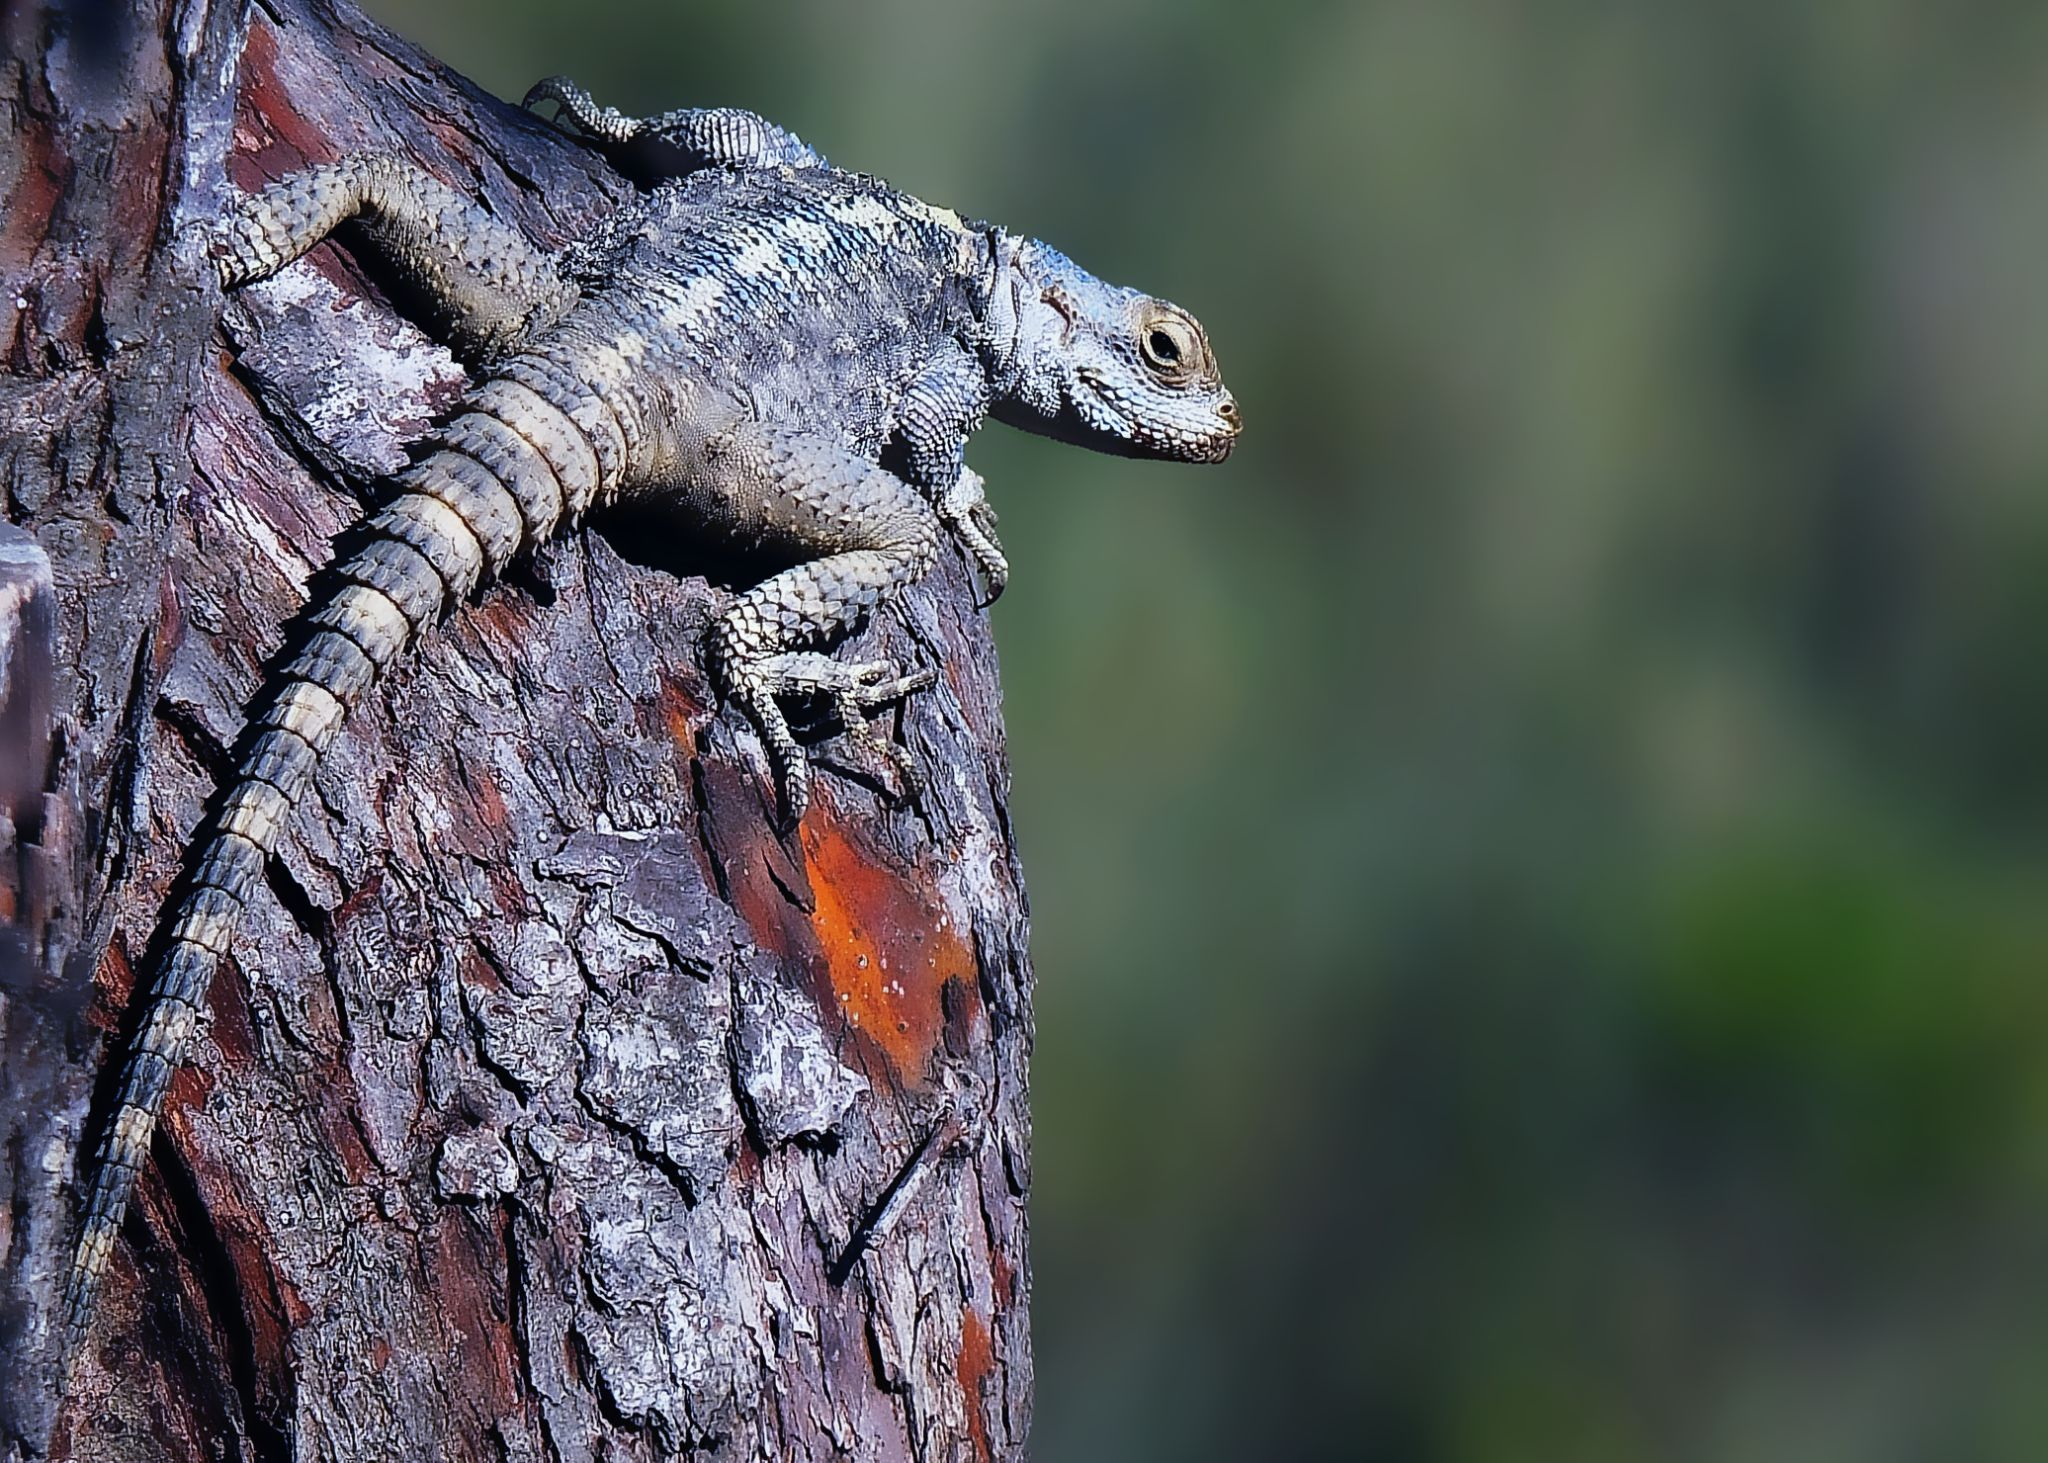 Salamander by kayhan.ozcicek